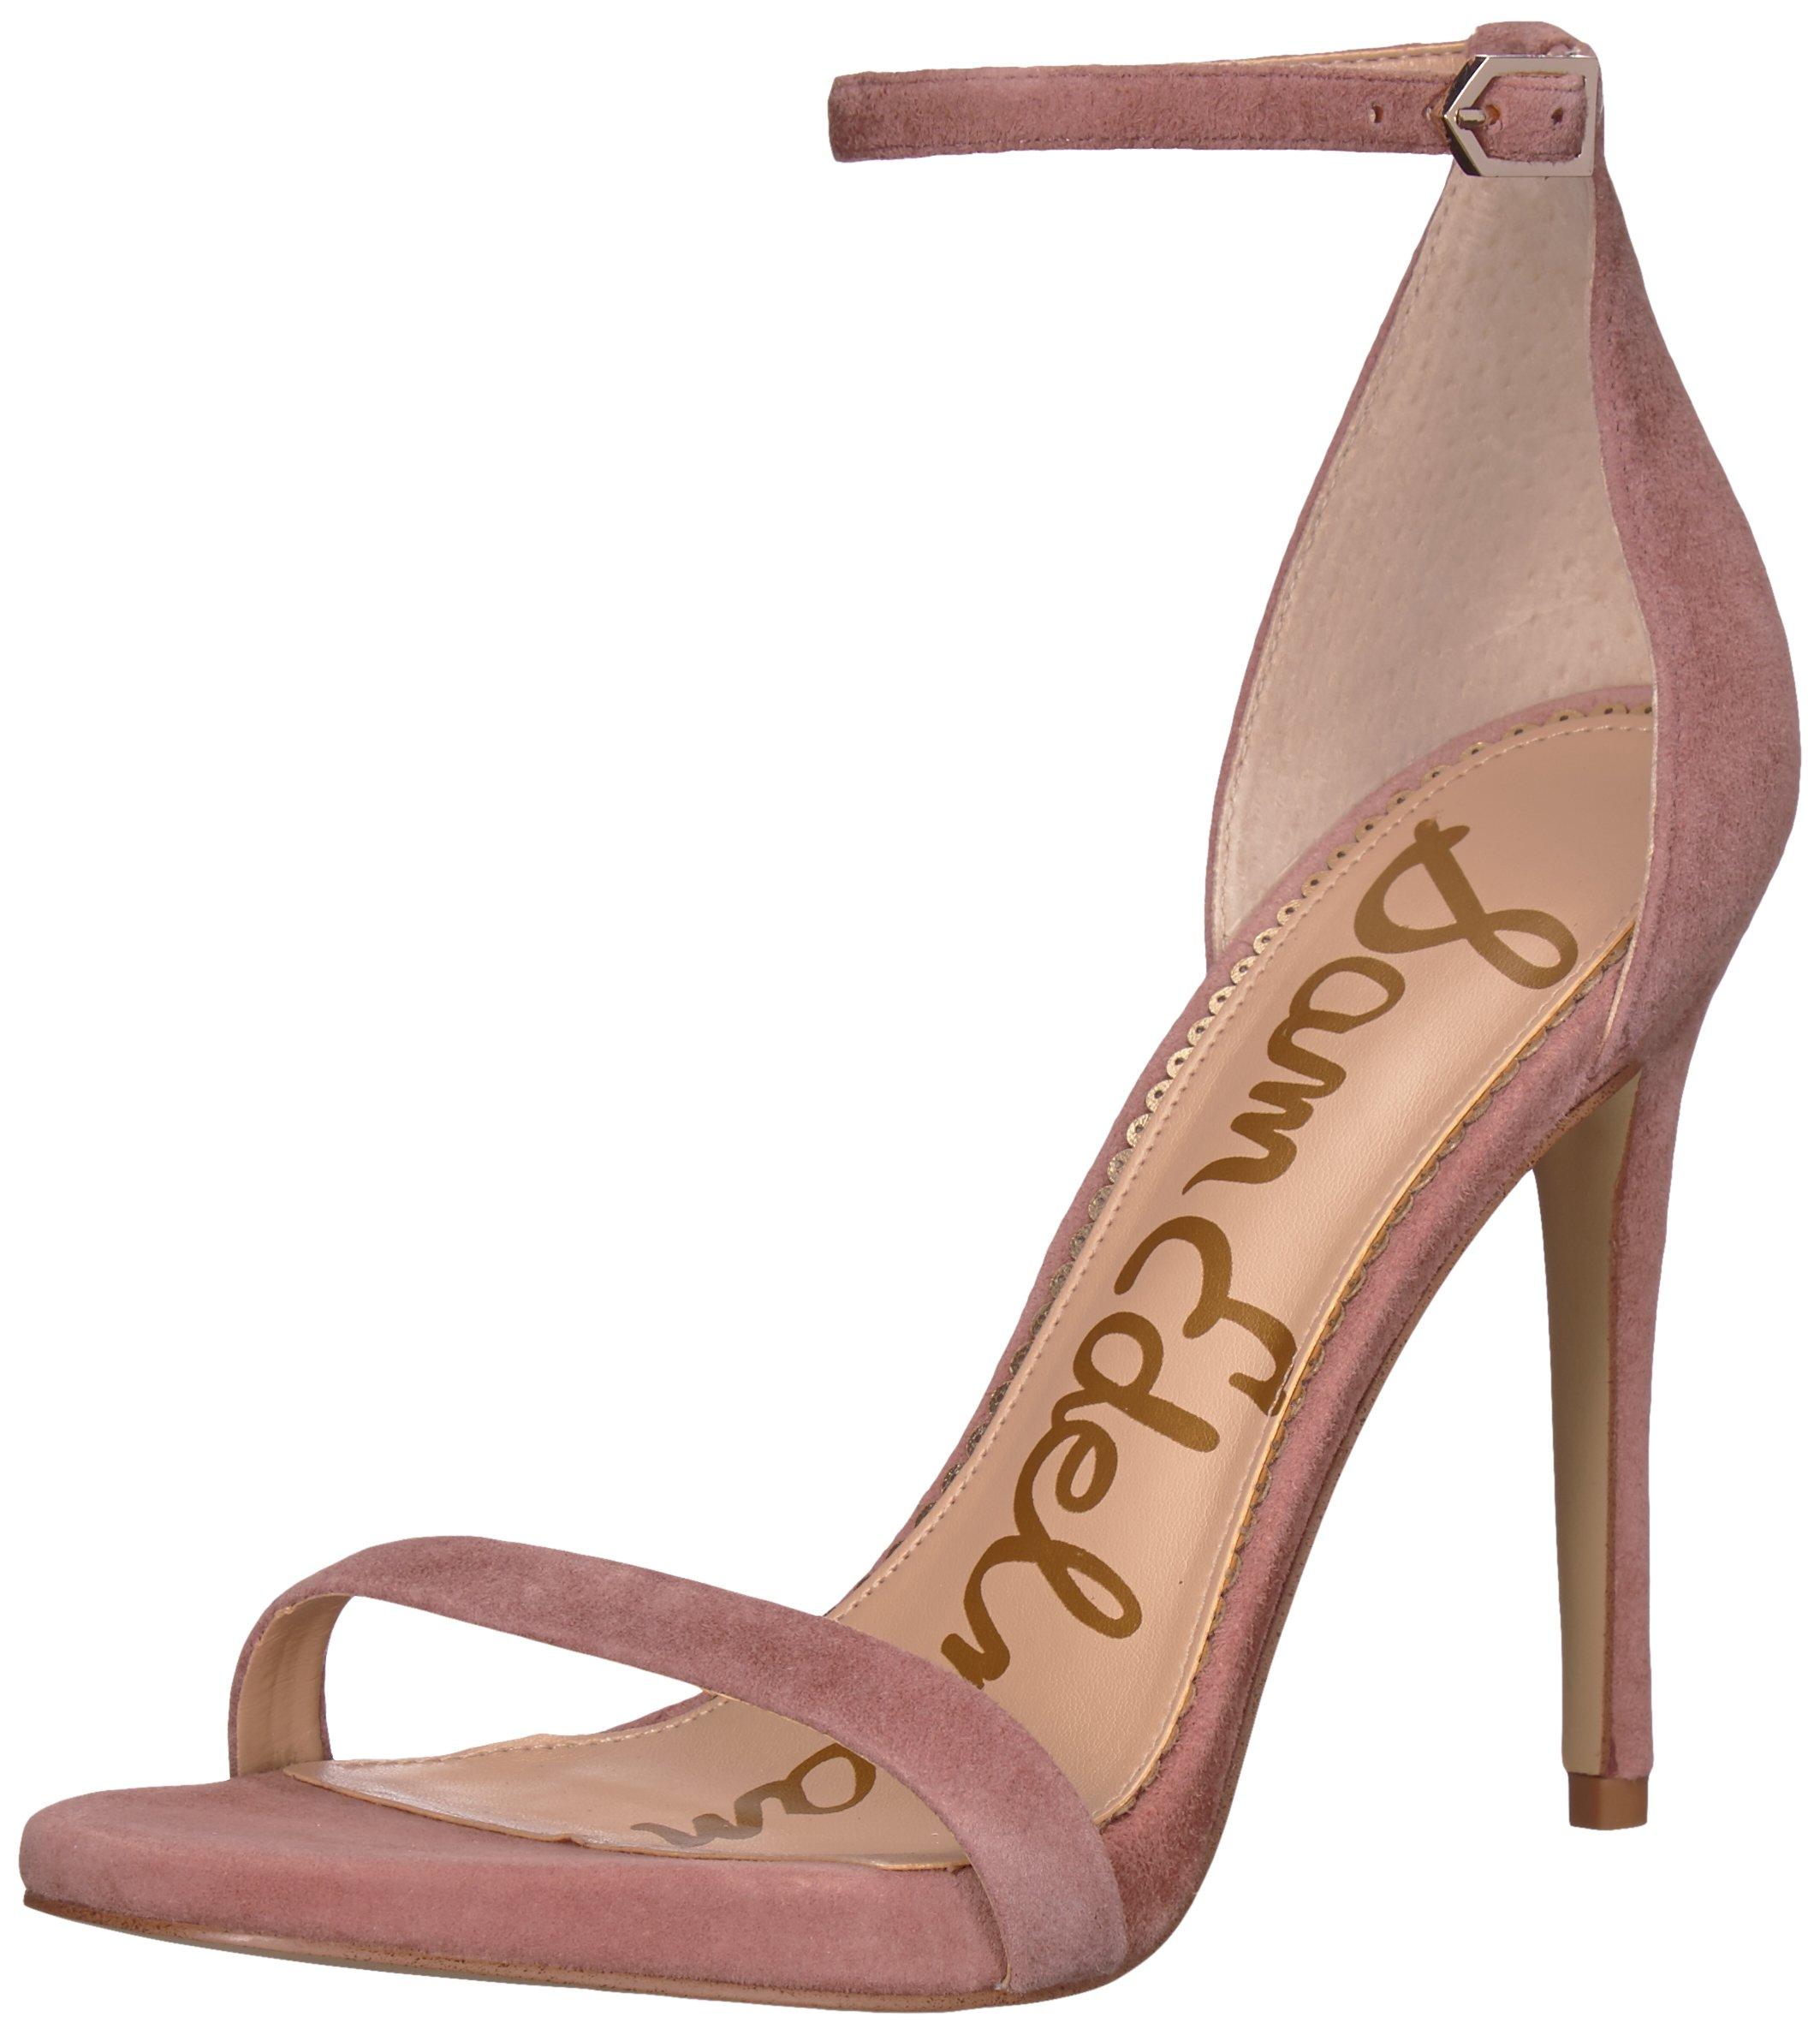 Sam Edelman Women's Ariella Heeled Sandal, Dusty Rose, 7.5 M US